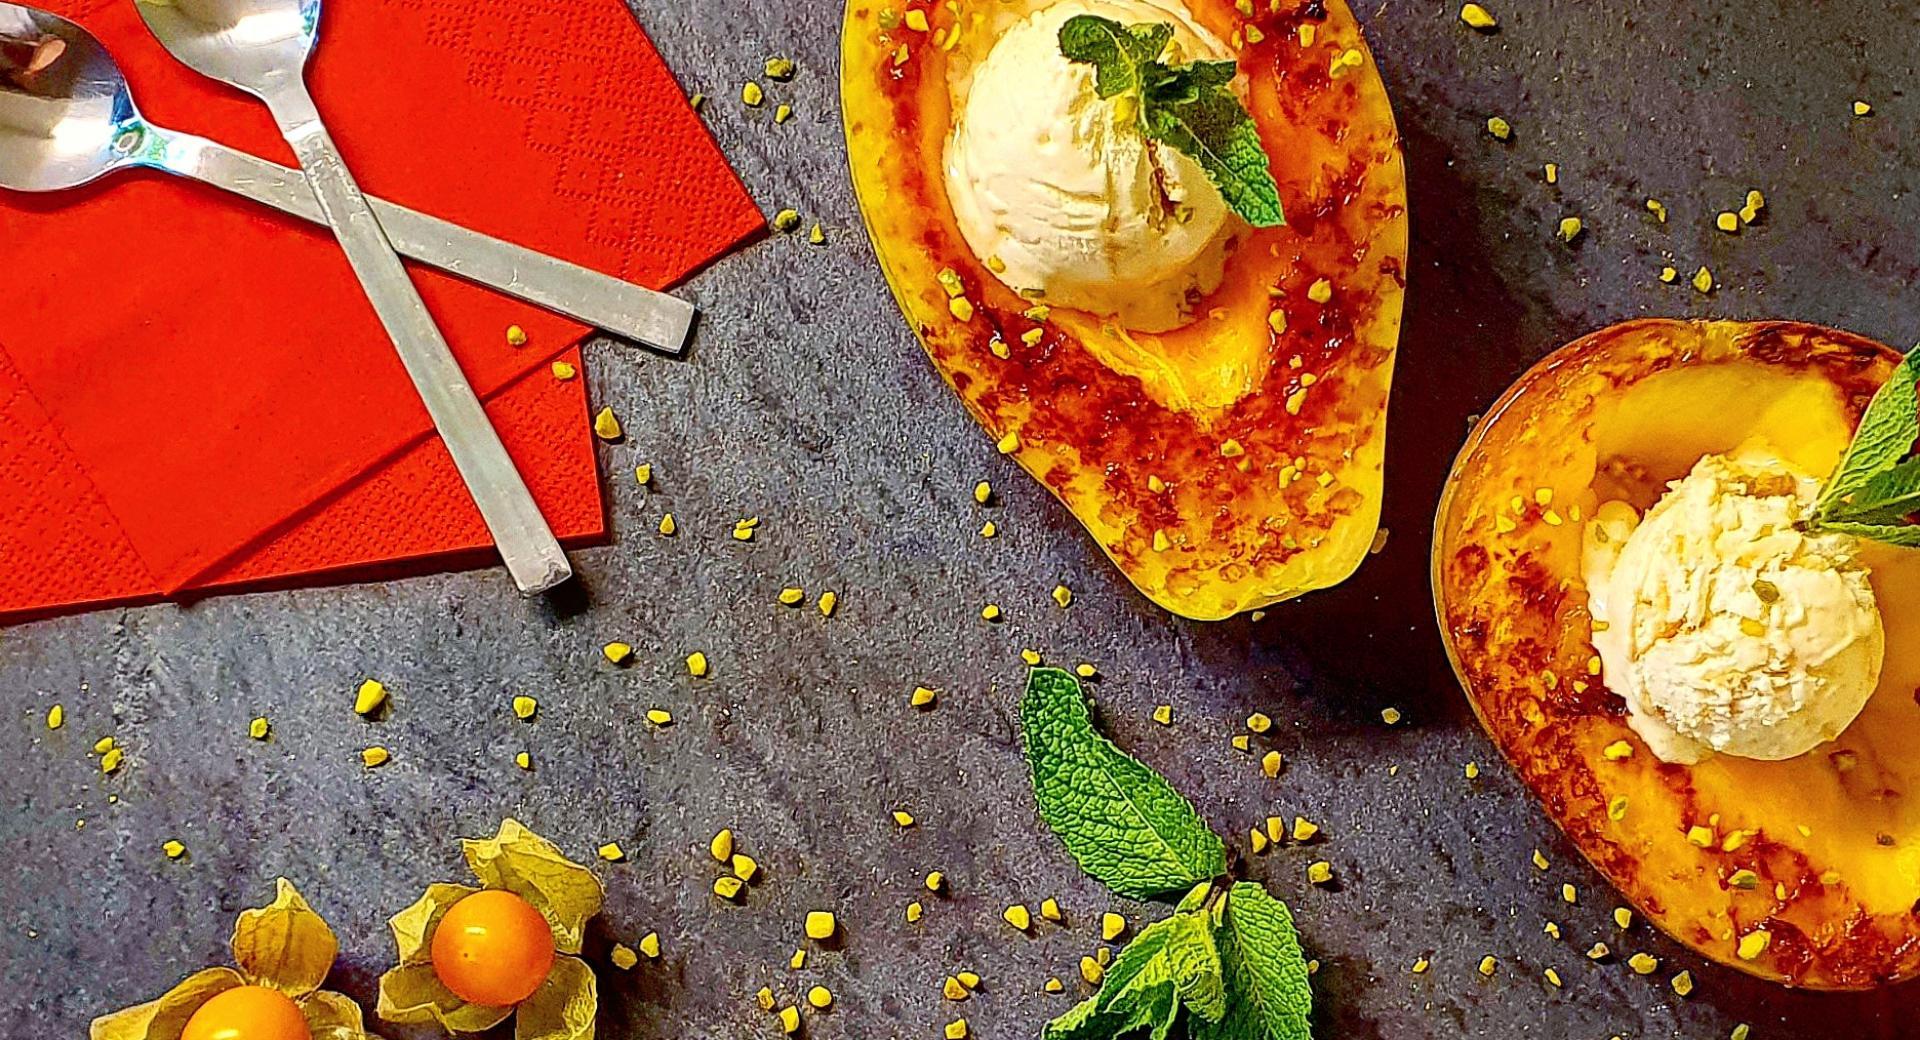 Grillierte Papaya mit Glace